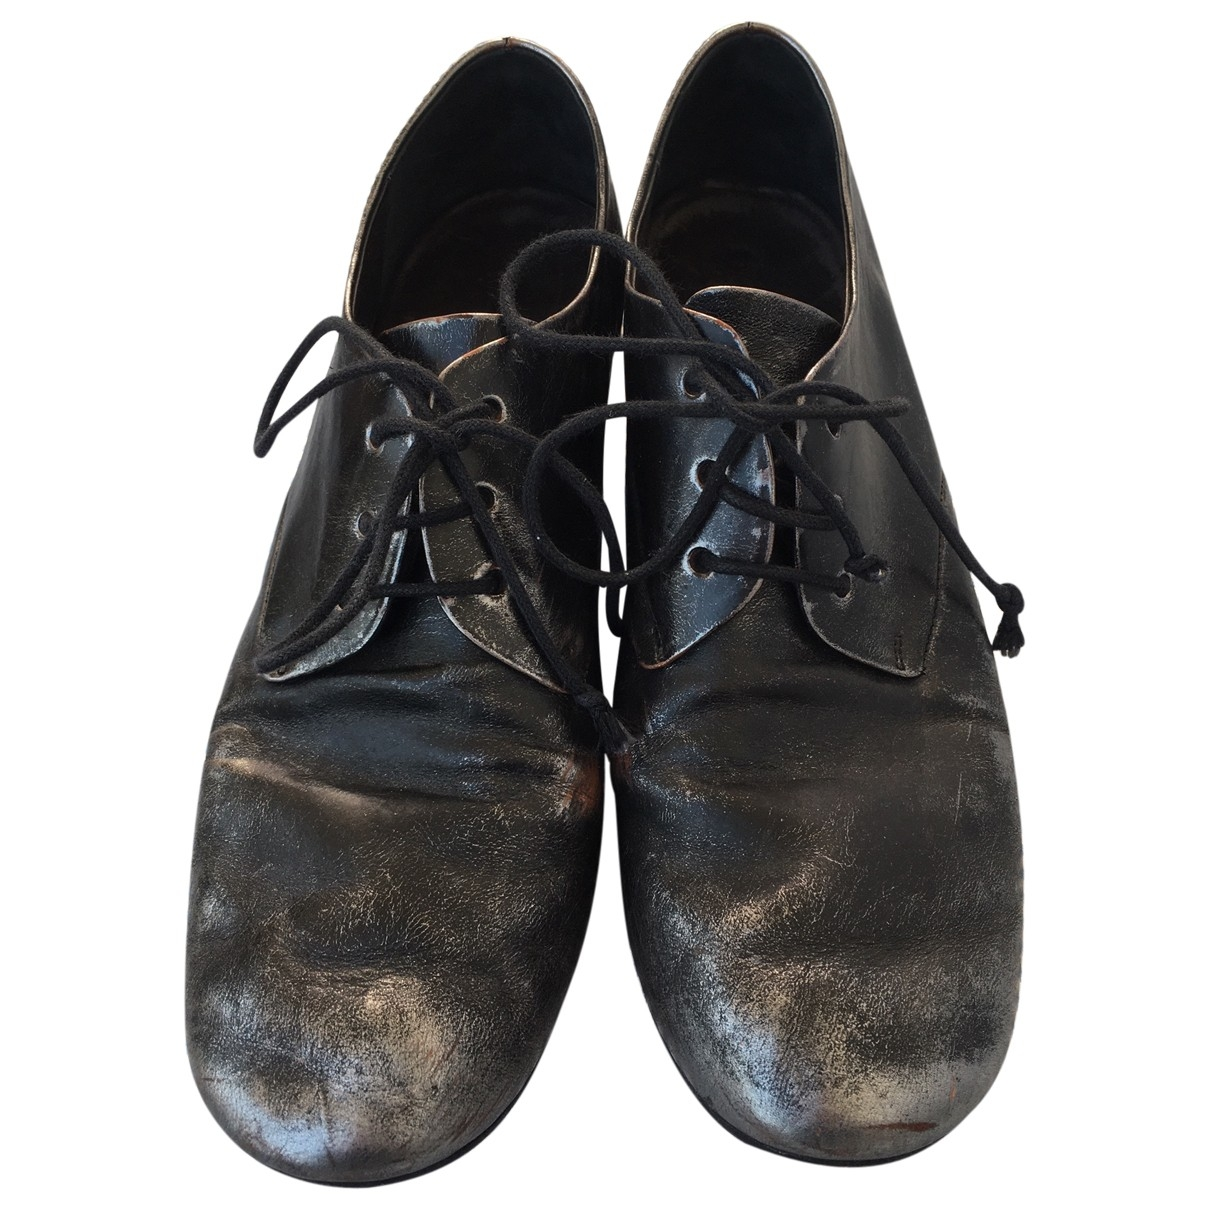 Marsell - Derbies   pour femme en cuir - noir